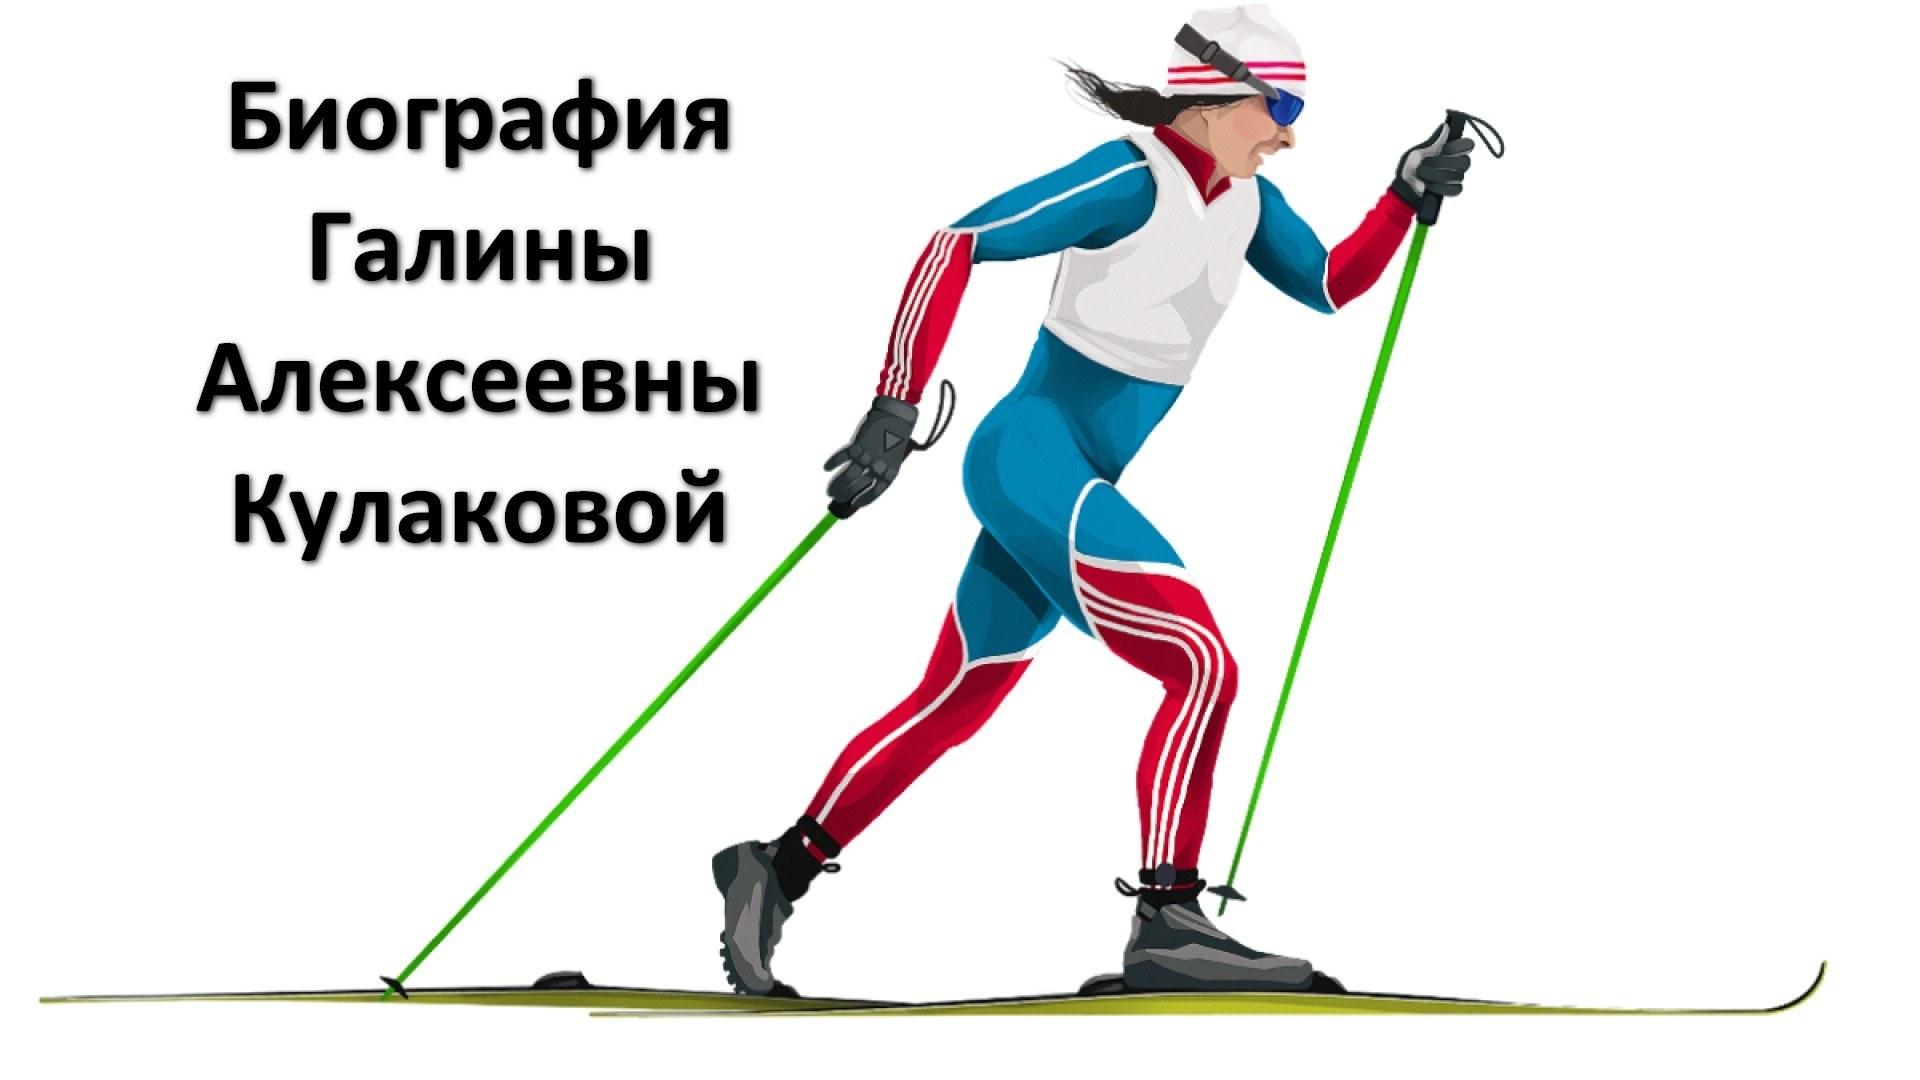 Галина Алексеевна Кулакова. Биогрфия